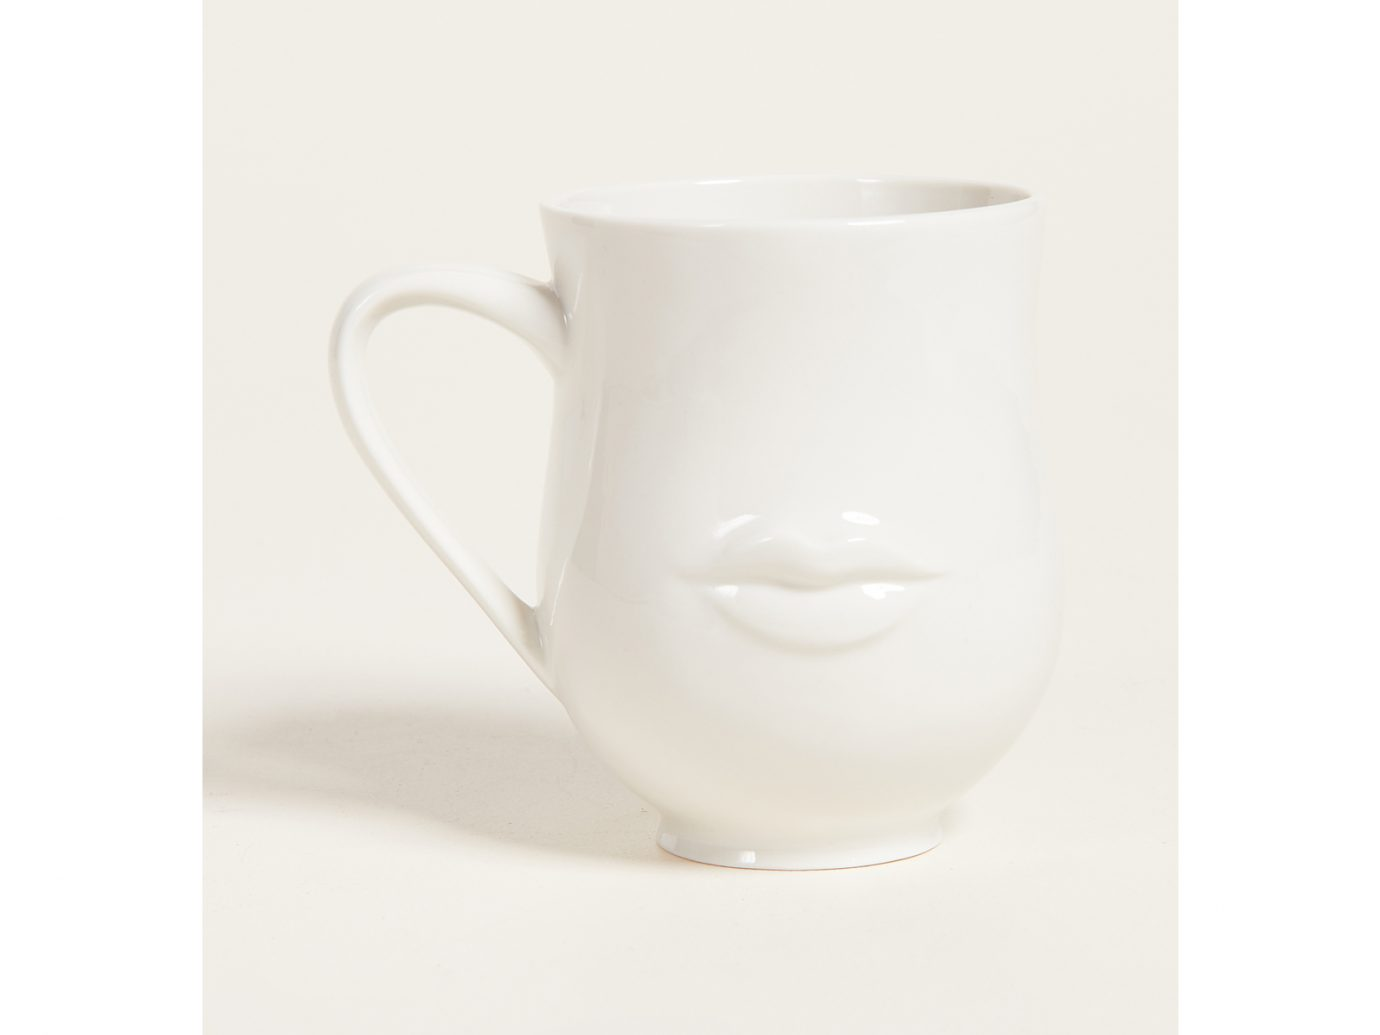 Jonathan Adler Mr & Mrs Muse Mug